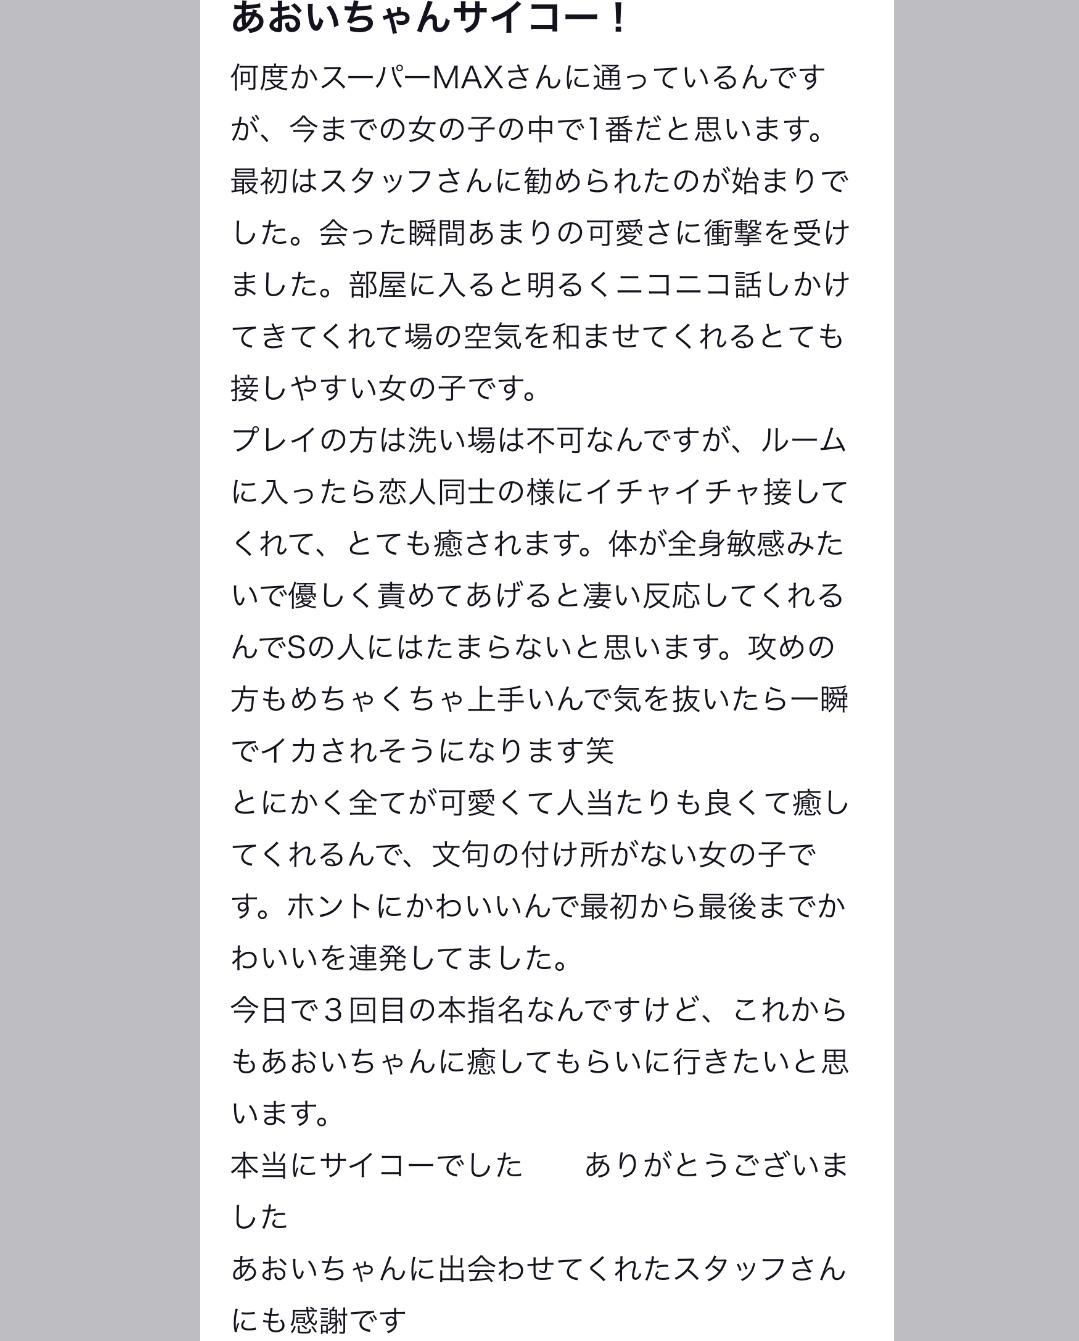 image0_80.jpeg